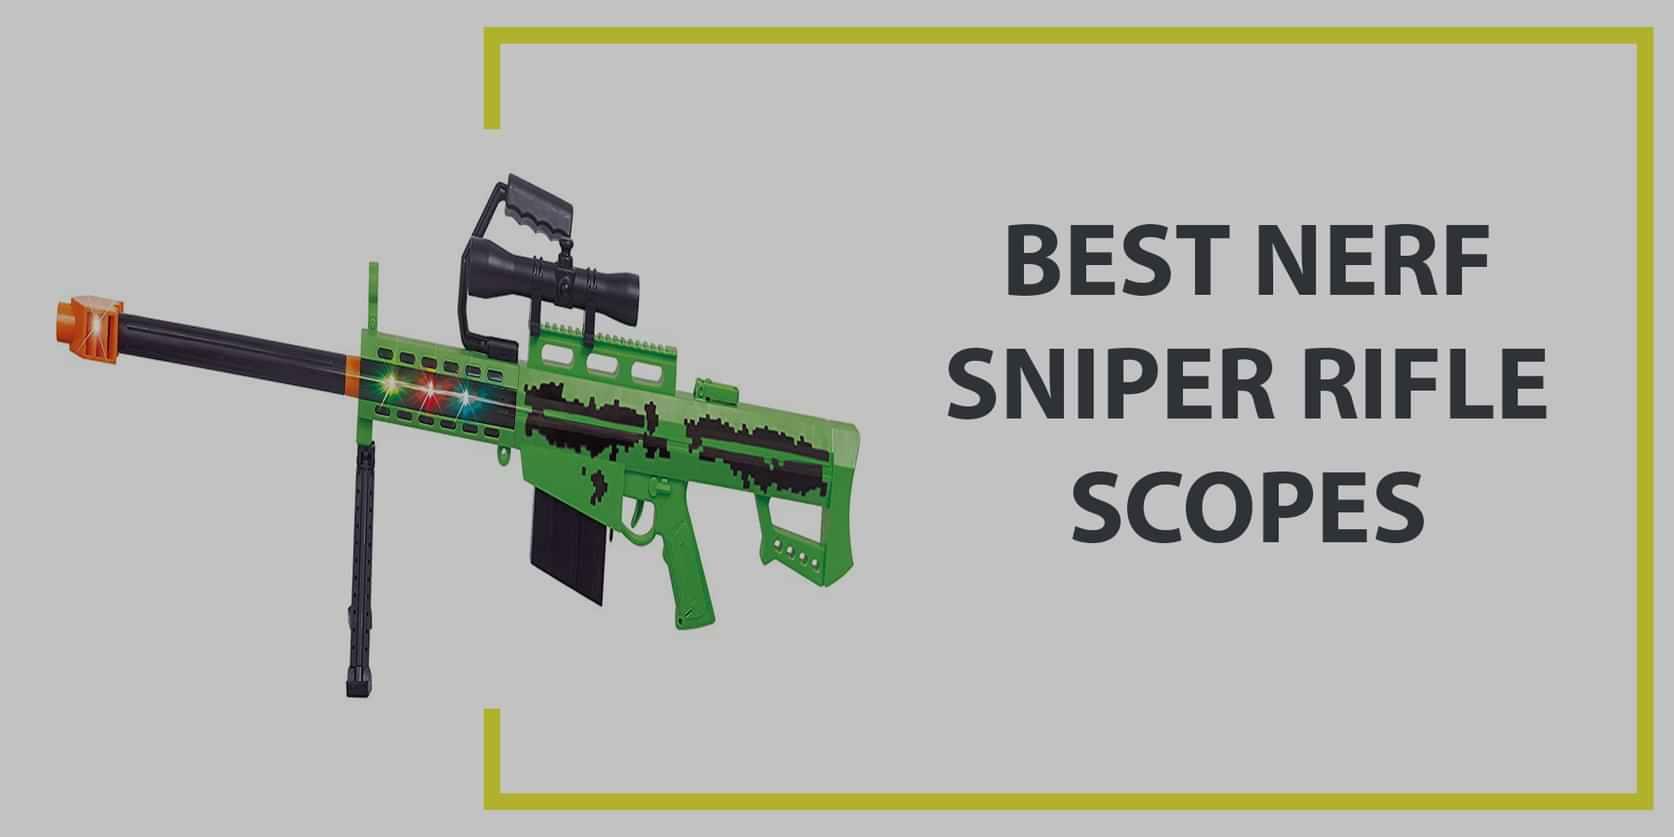 Best Nerf Sniper